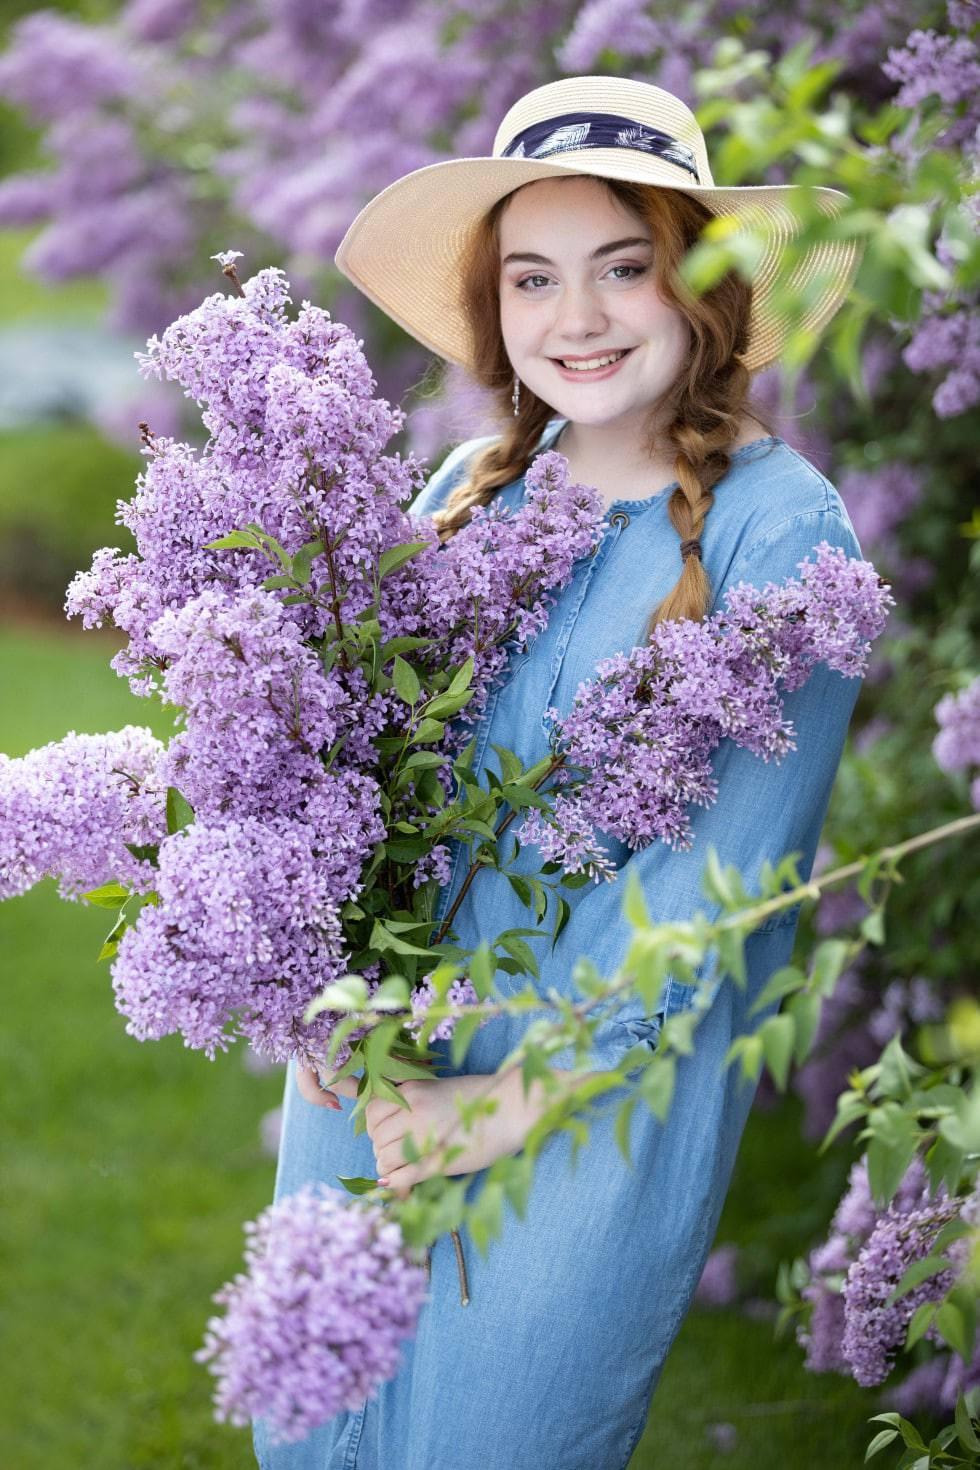 fun_bright_senior_girl_flowers_portrait